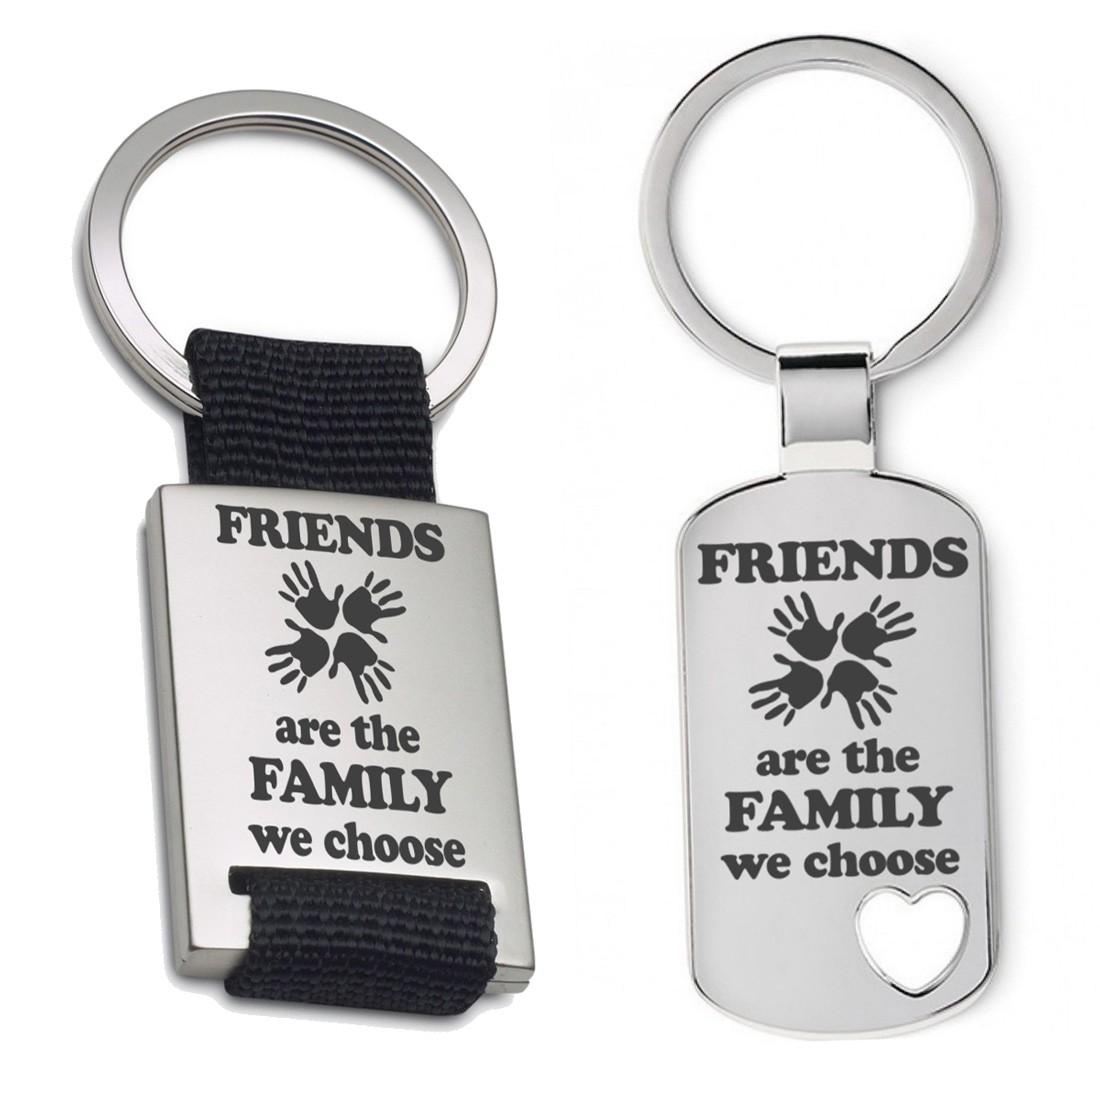 Schlüsselanhänger: Friends are the family we choose